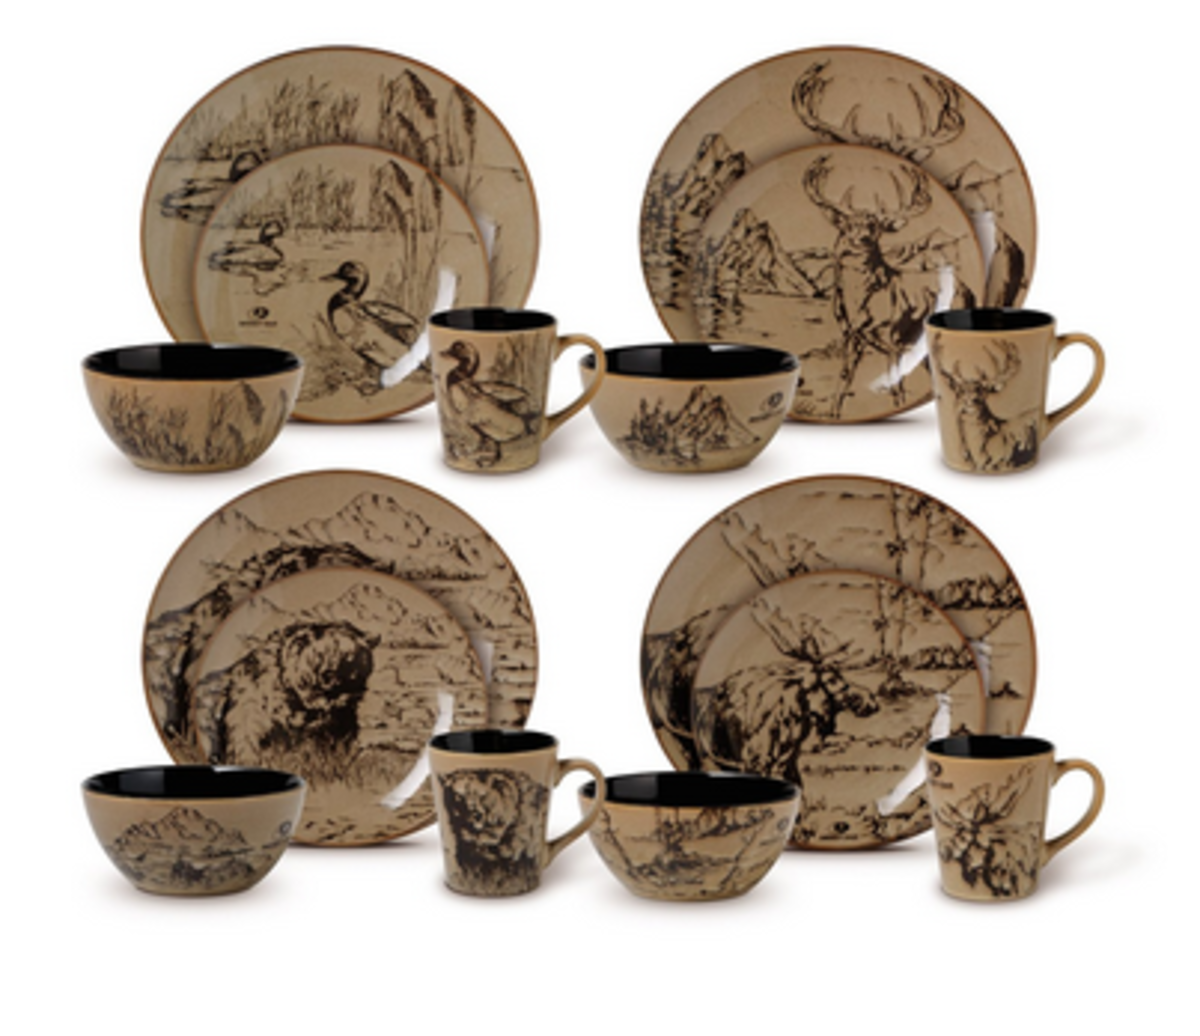 lodge-dinnerware-and-flatware-sets